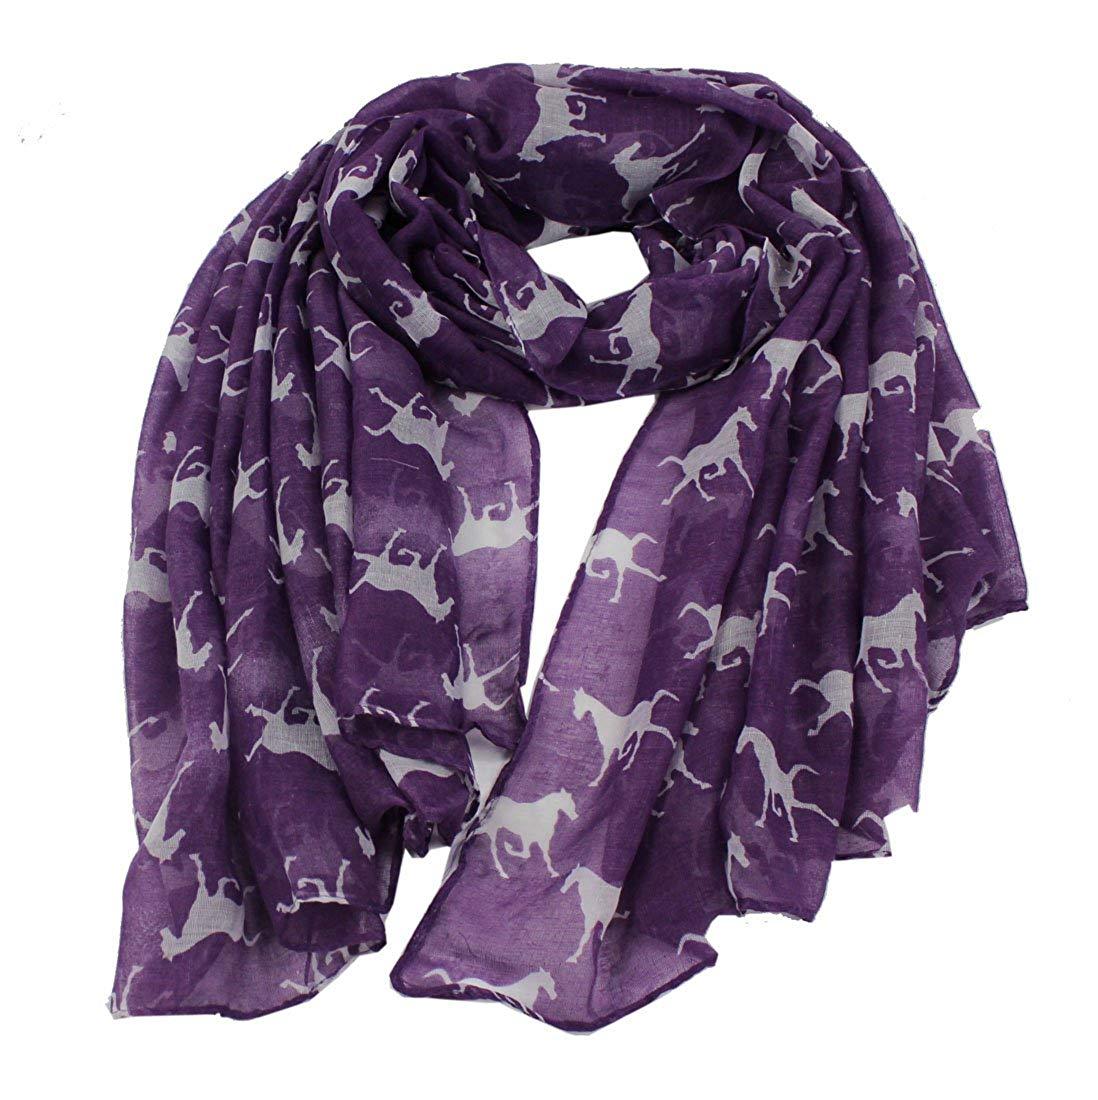 Cream baby Owl Print Scarf Shawl Stole Wrap Hijab 100/% Viscose